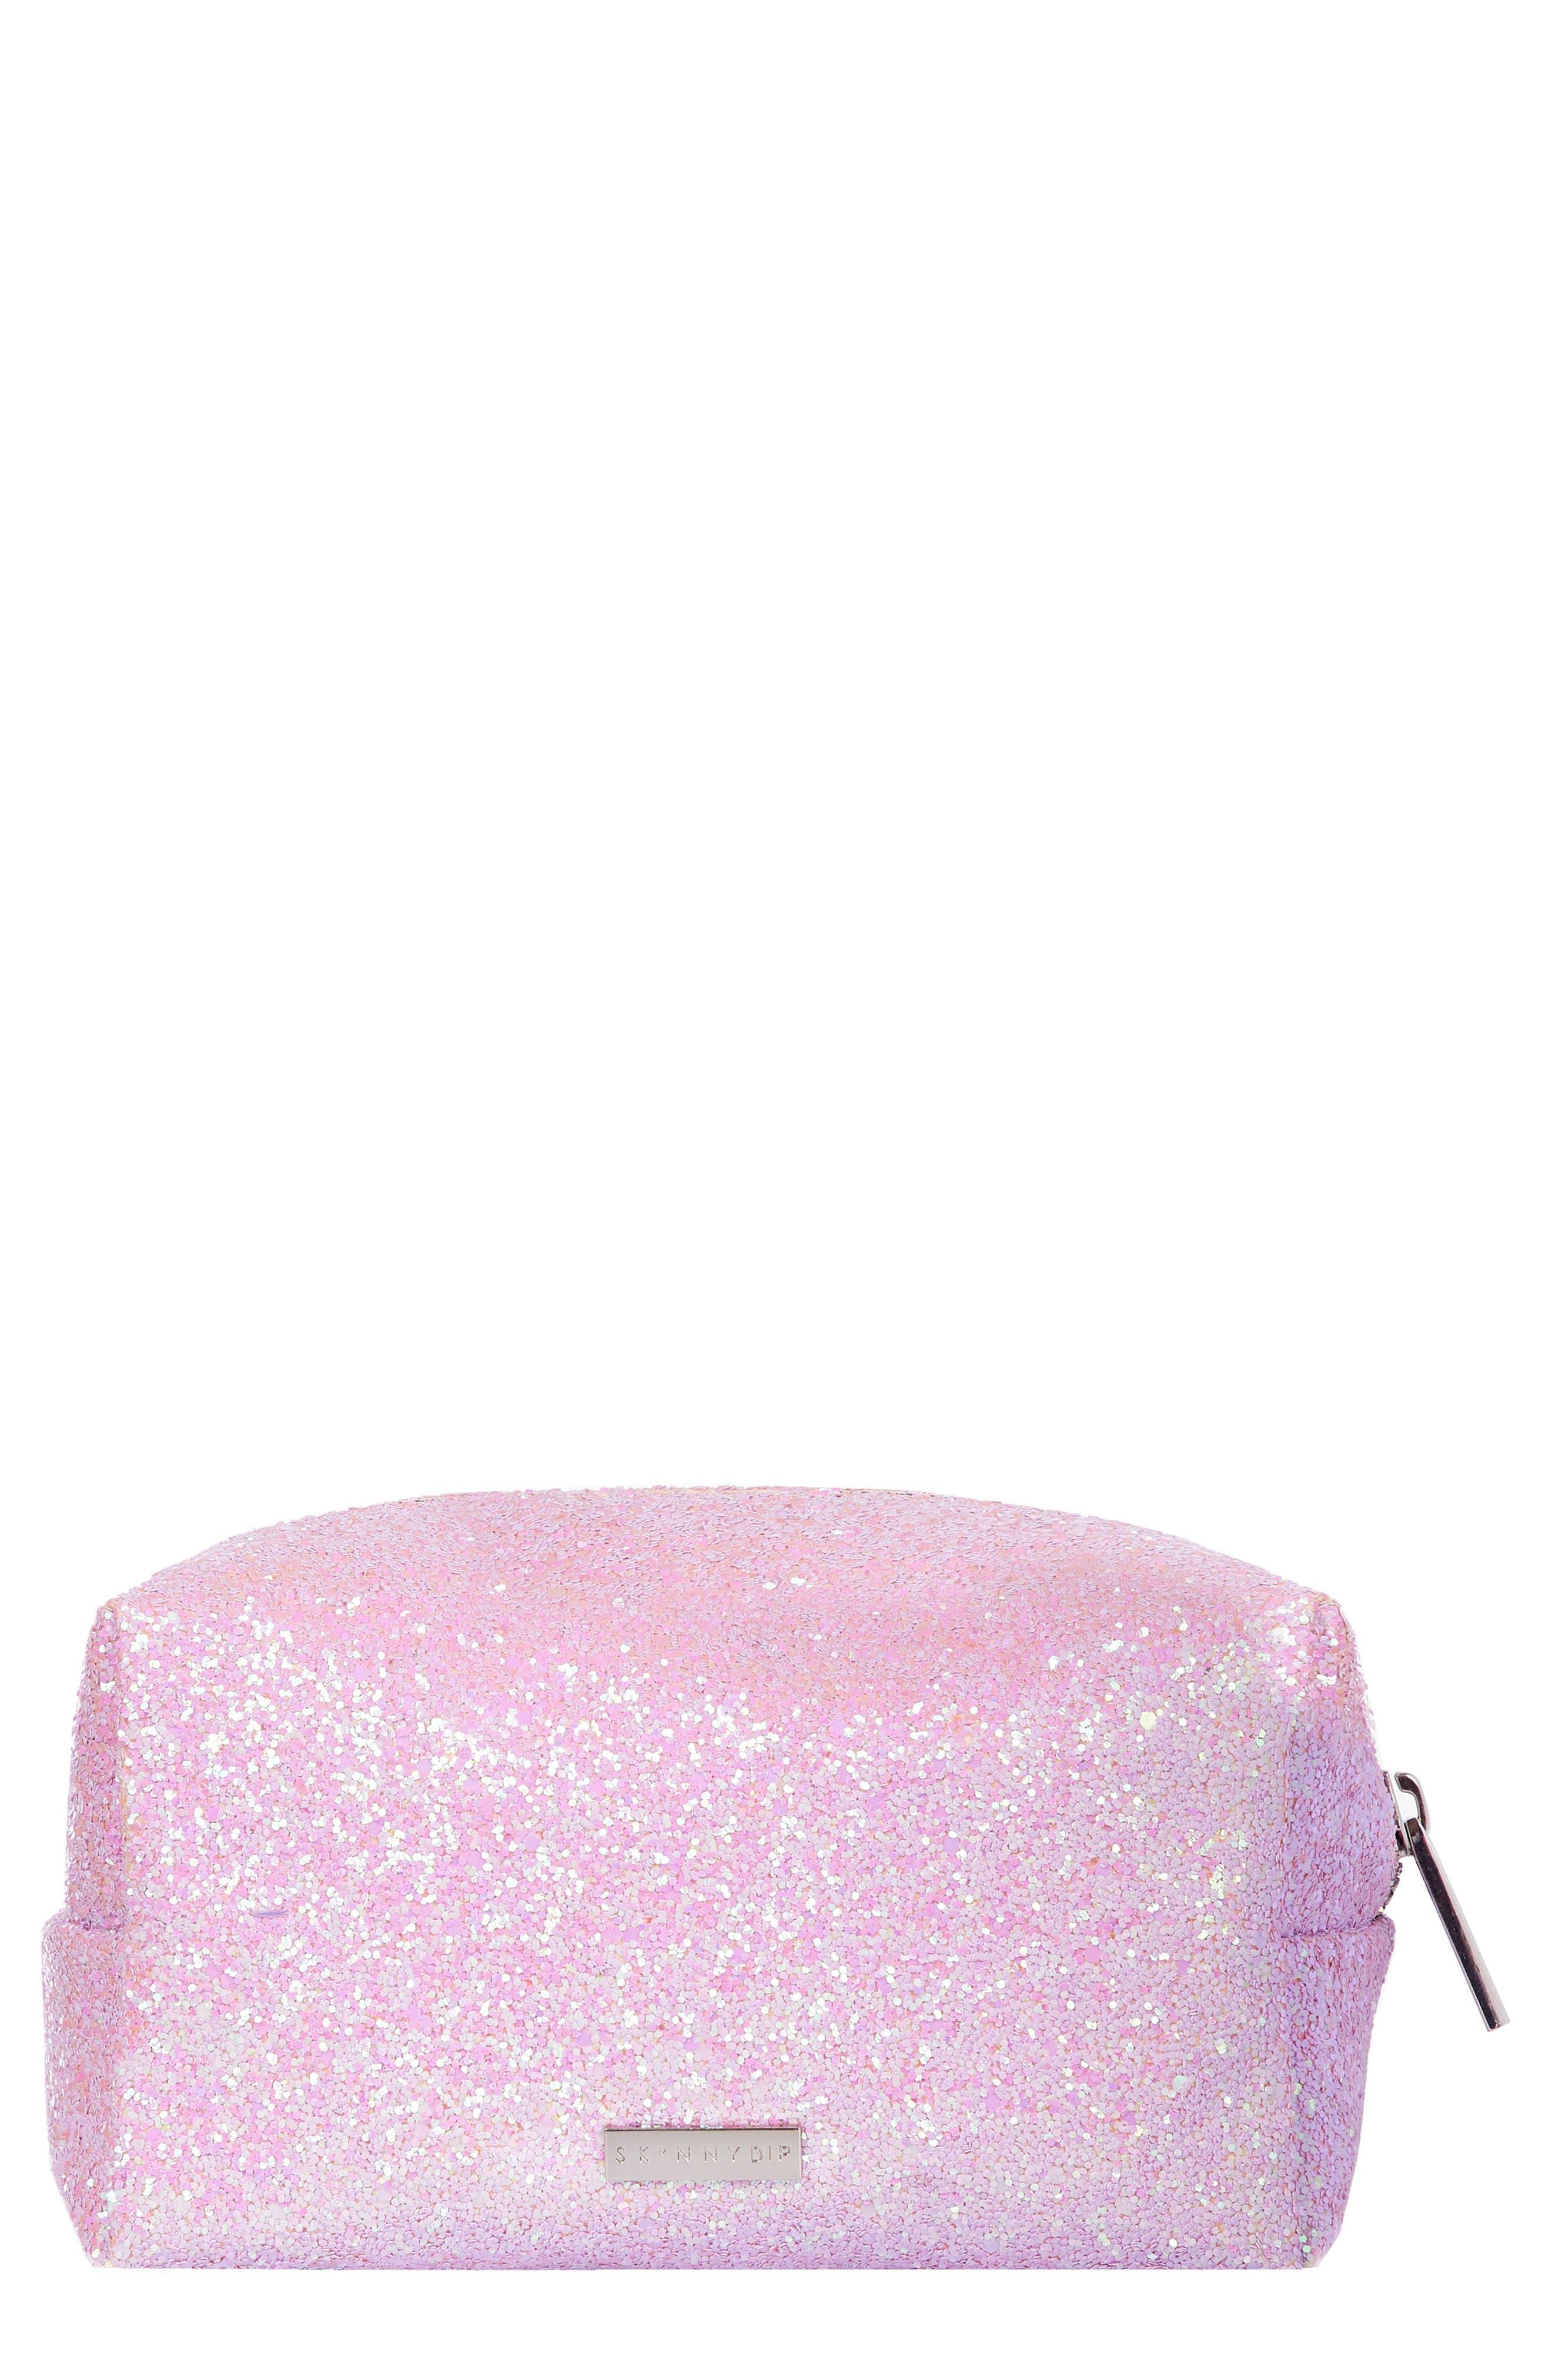 Skinny Dip Pink Glitsy Cosmetics Case,                             Main thumbnail 1, color,                             NO COLOR